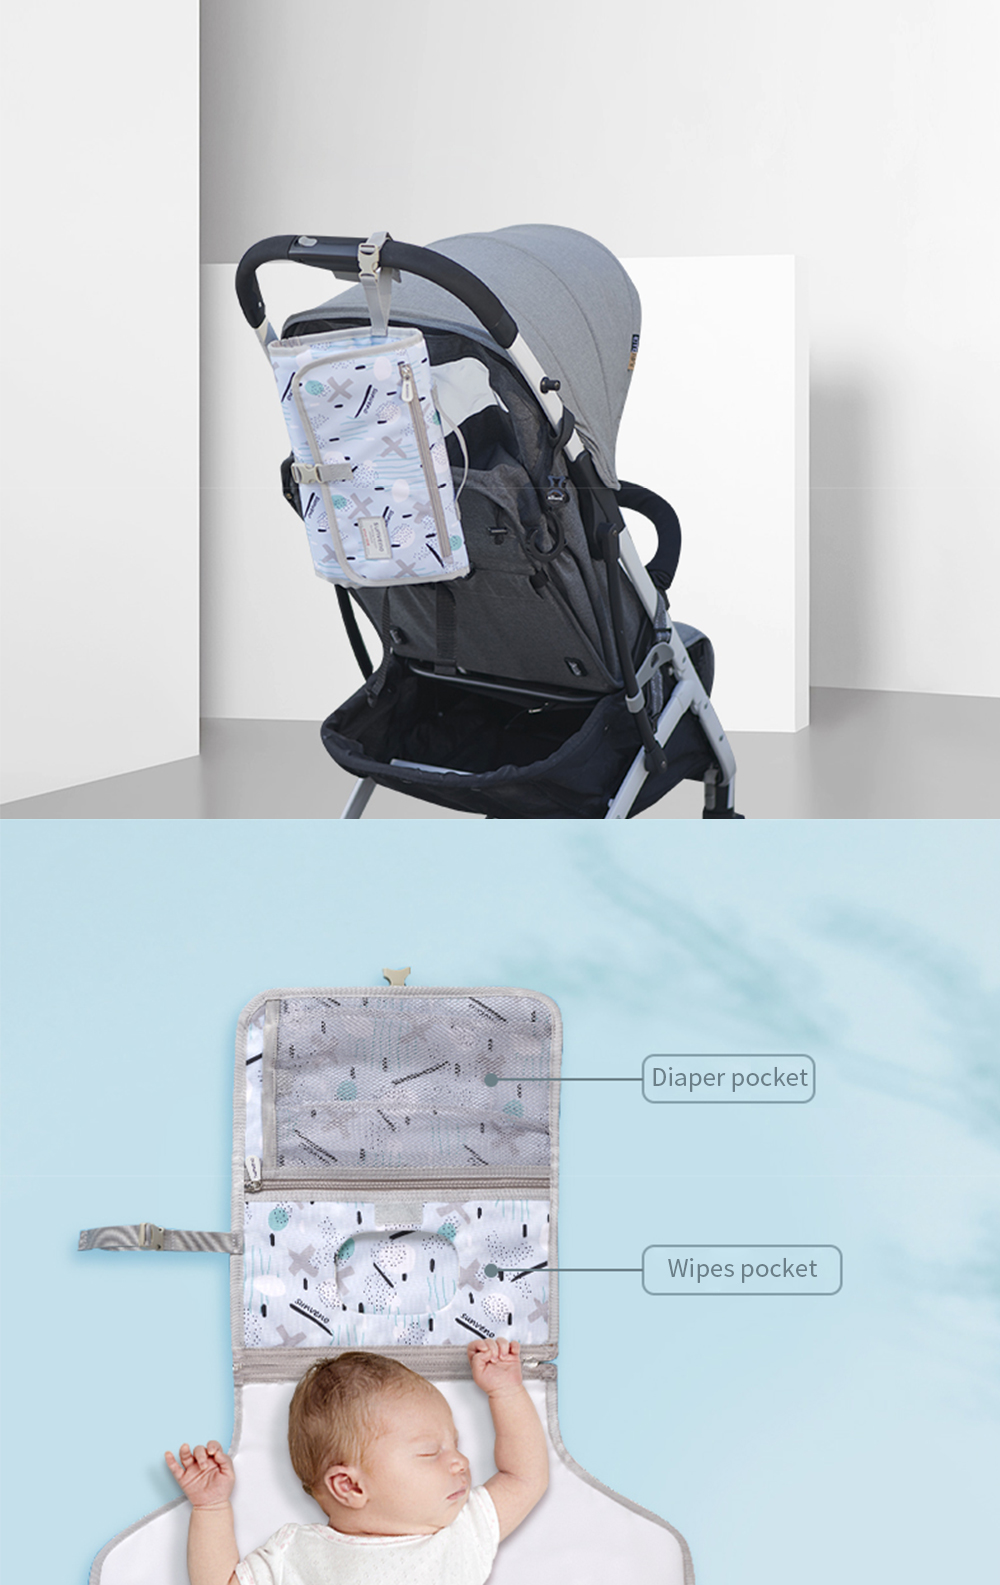 Portable Baby Changing Mat Foldable Washable Waterproof Mattress Changing Pad